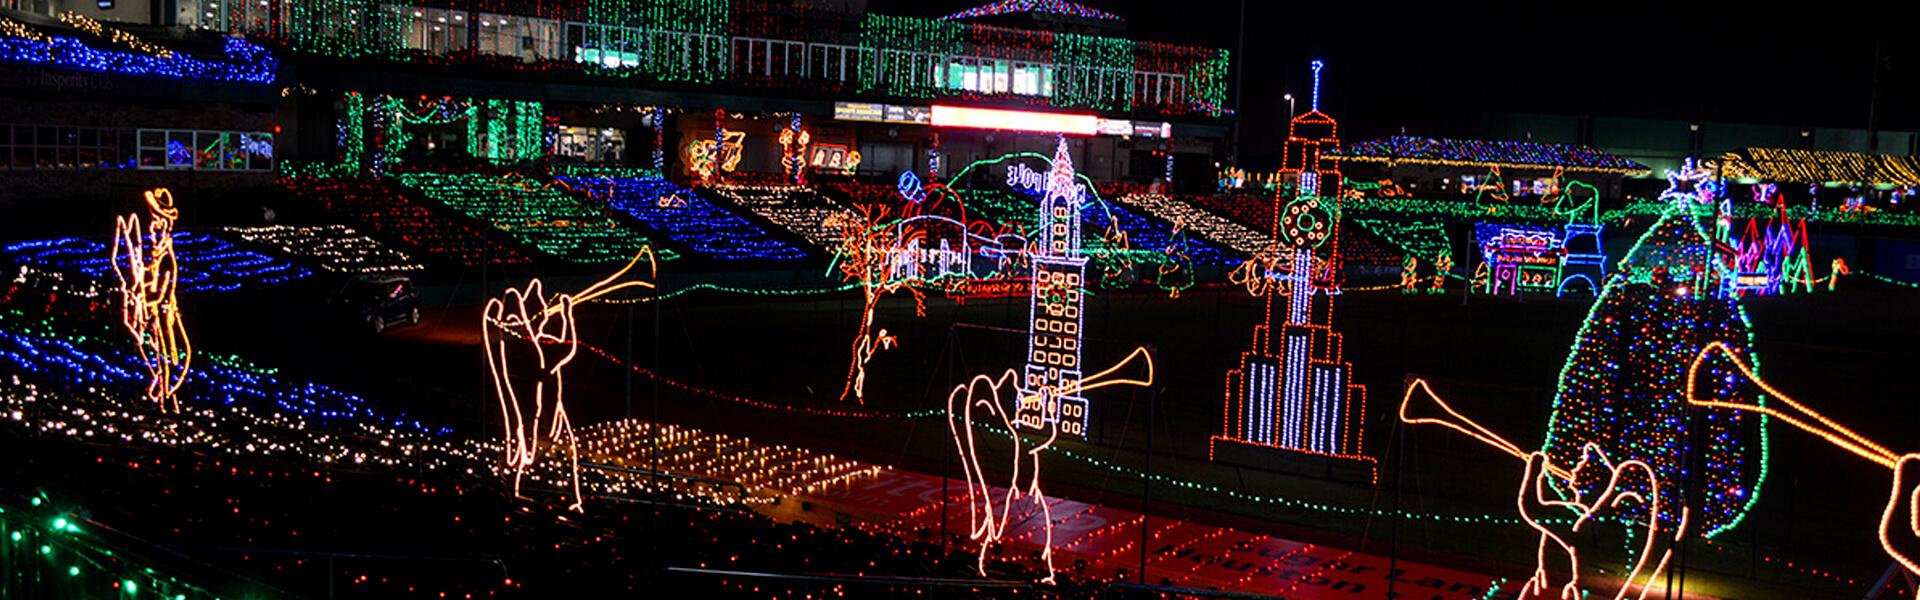 About | Sugar Land Holiday Lights